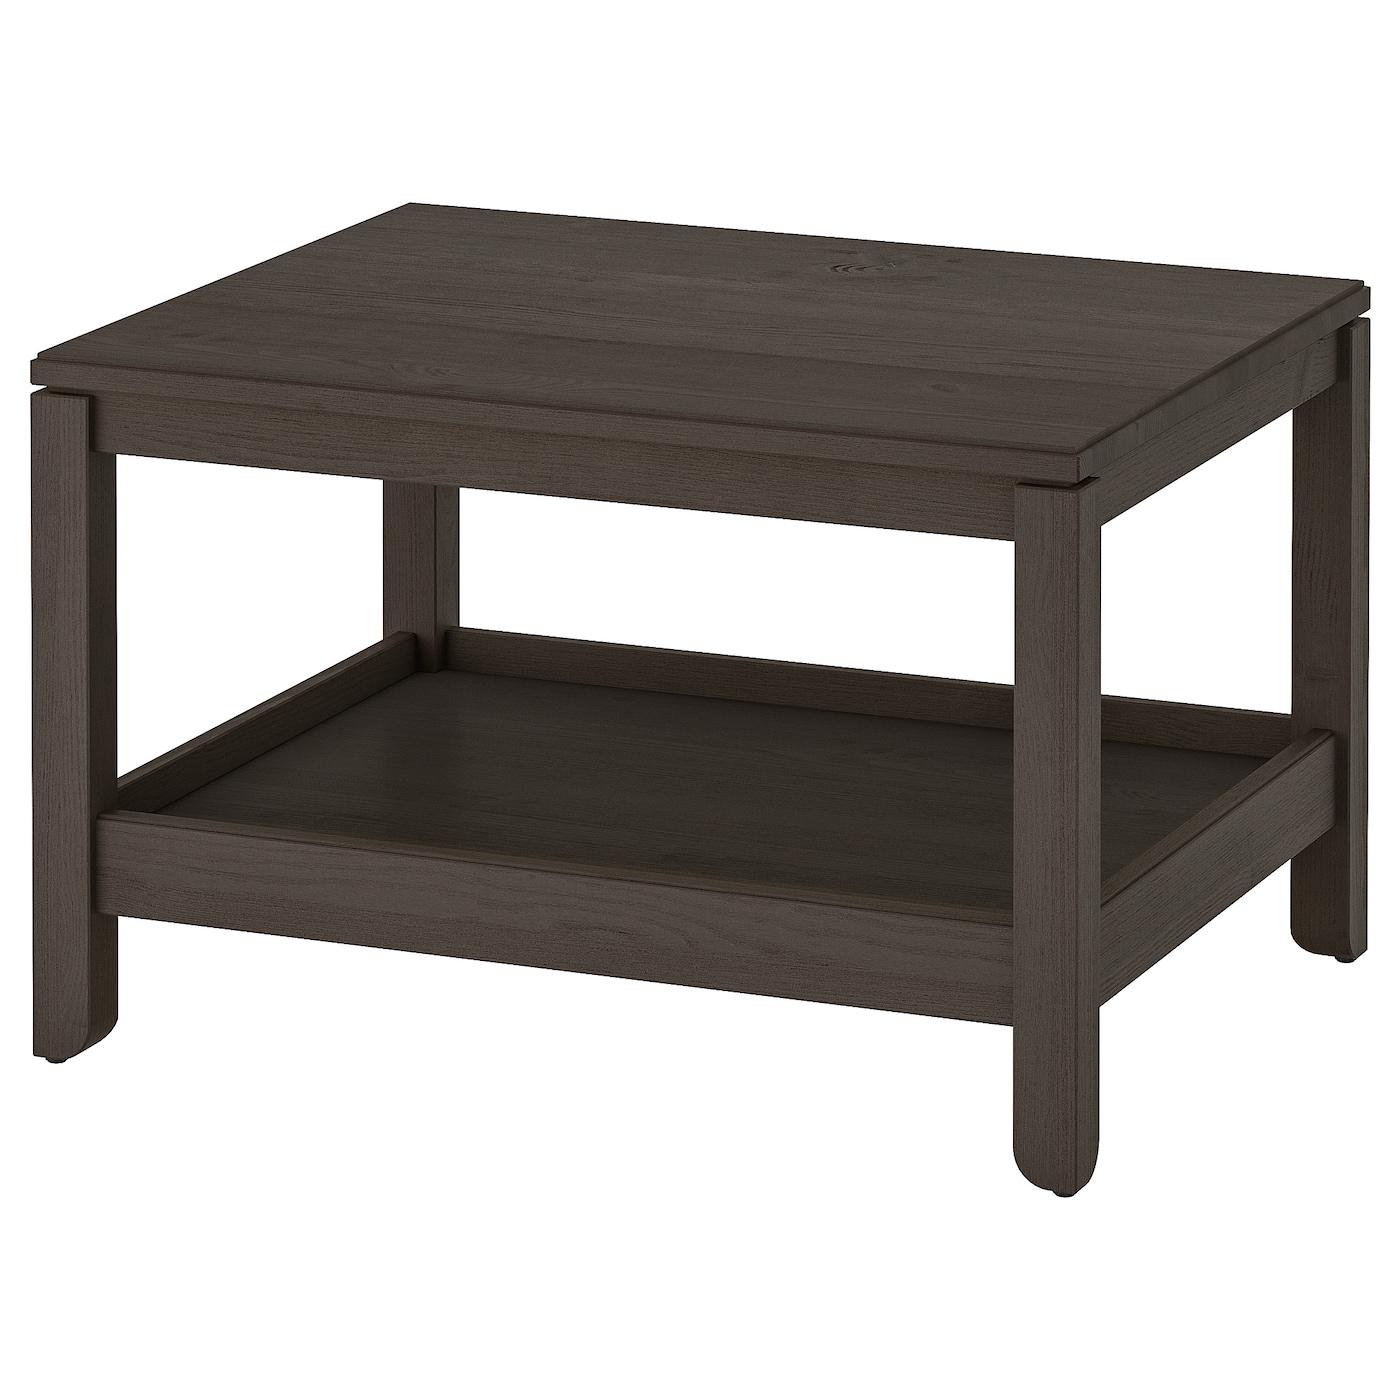 - HAVSTA Coffee Table - Dark Brown - IKEA